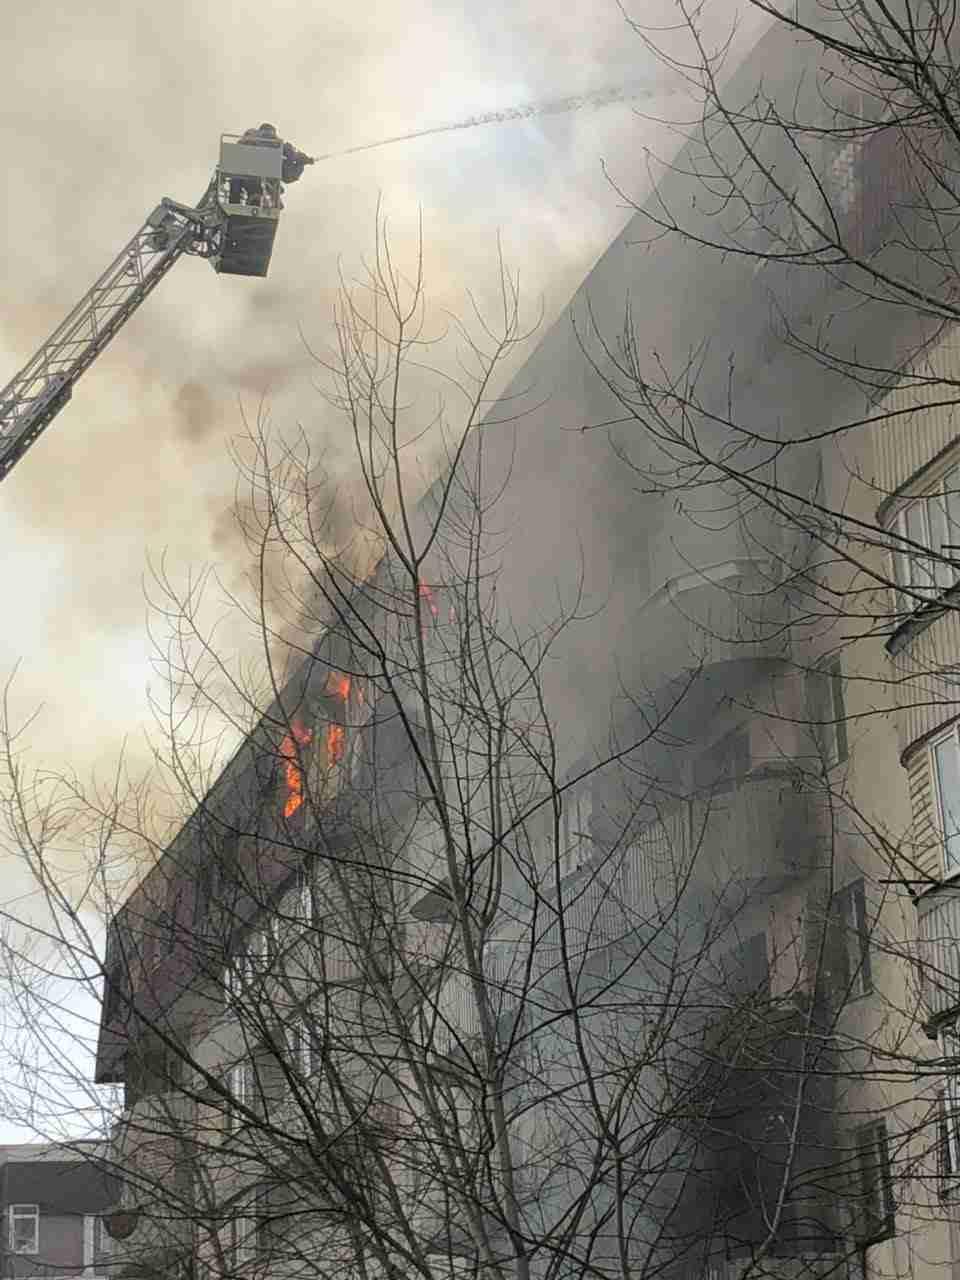 Спасение младенца из горящего дома в Казахстане попало на видео